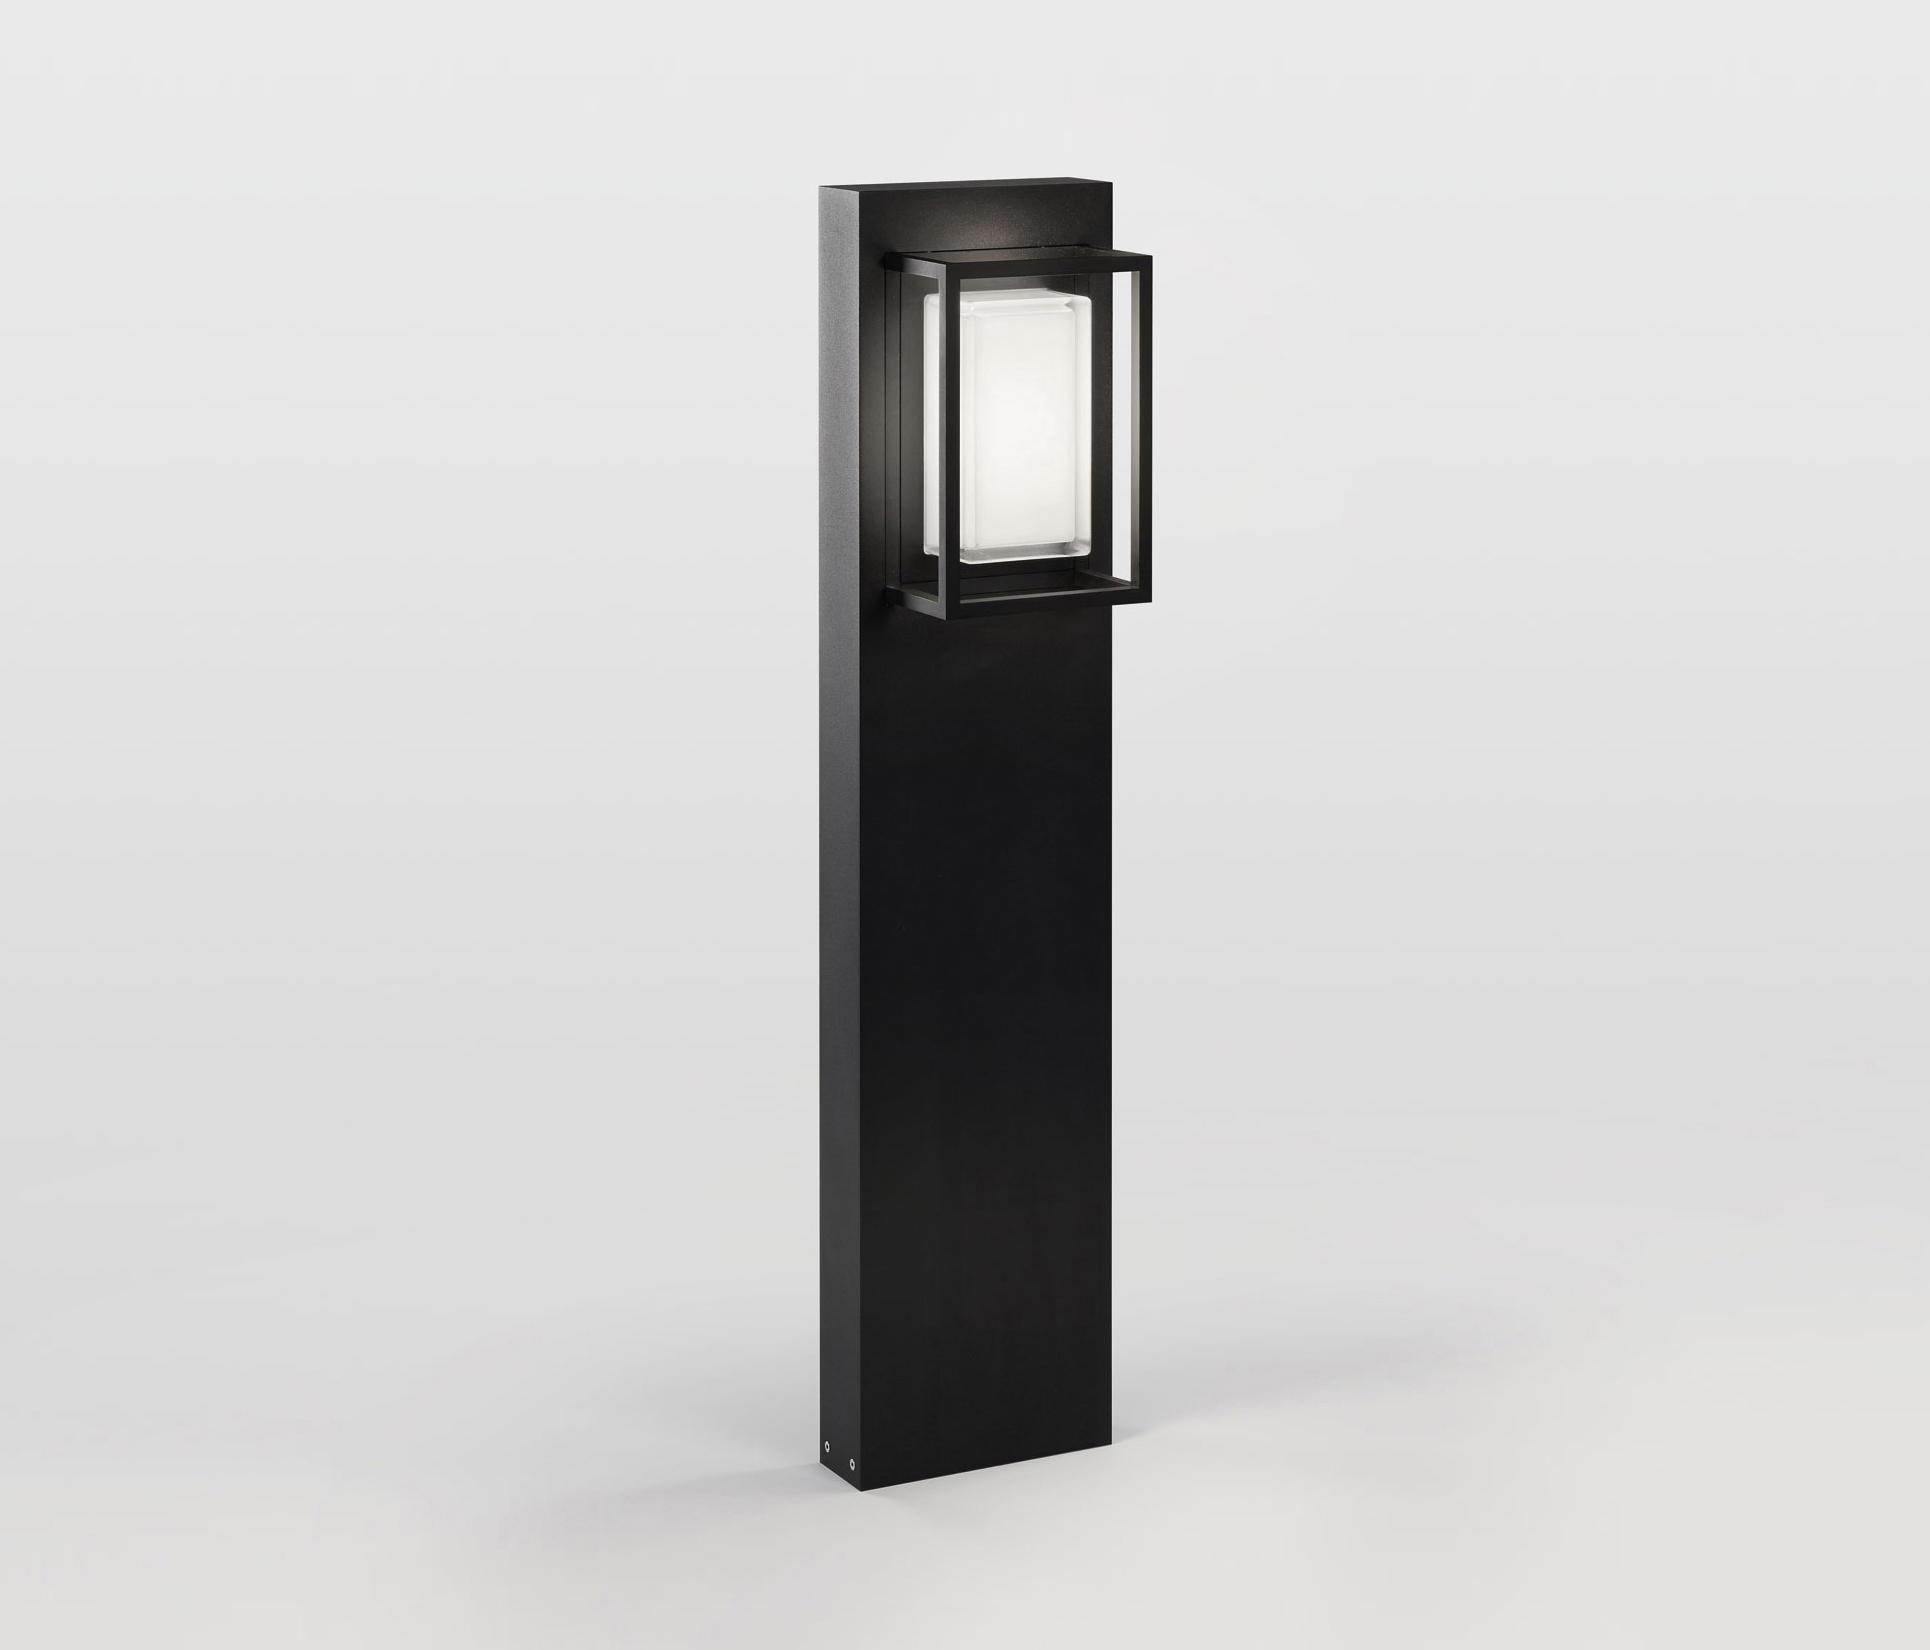 montur m p 90 led allgemeinbeleuchtung von delta light architonic. Black Bedroom Furniture Sets. Home Design Ideas